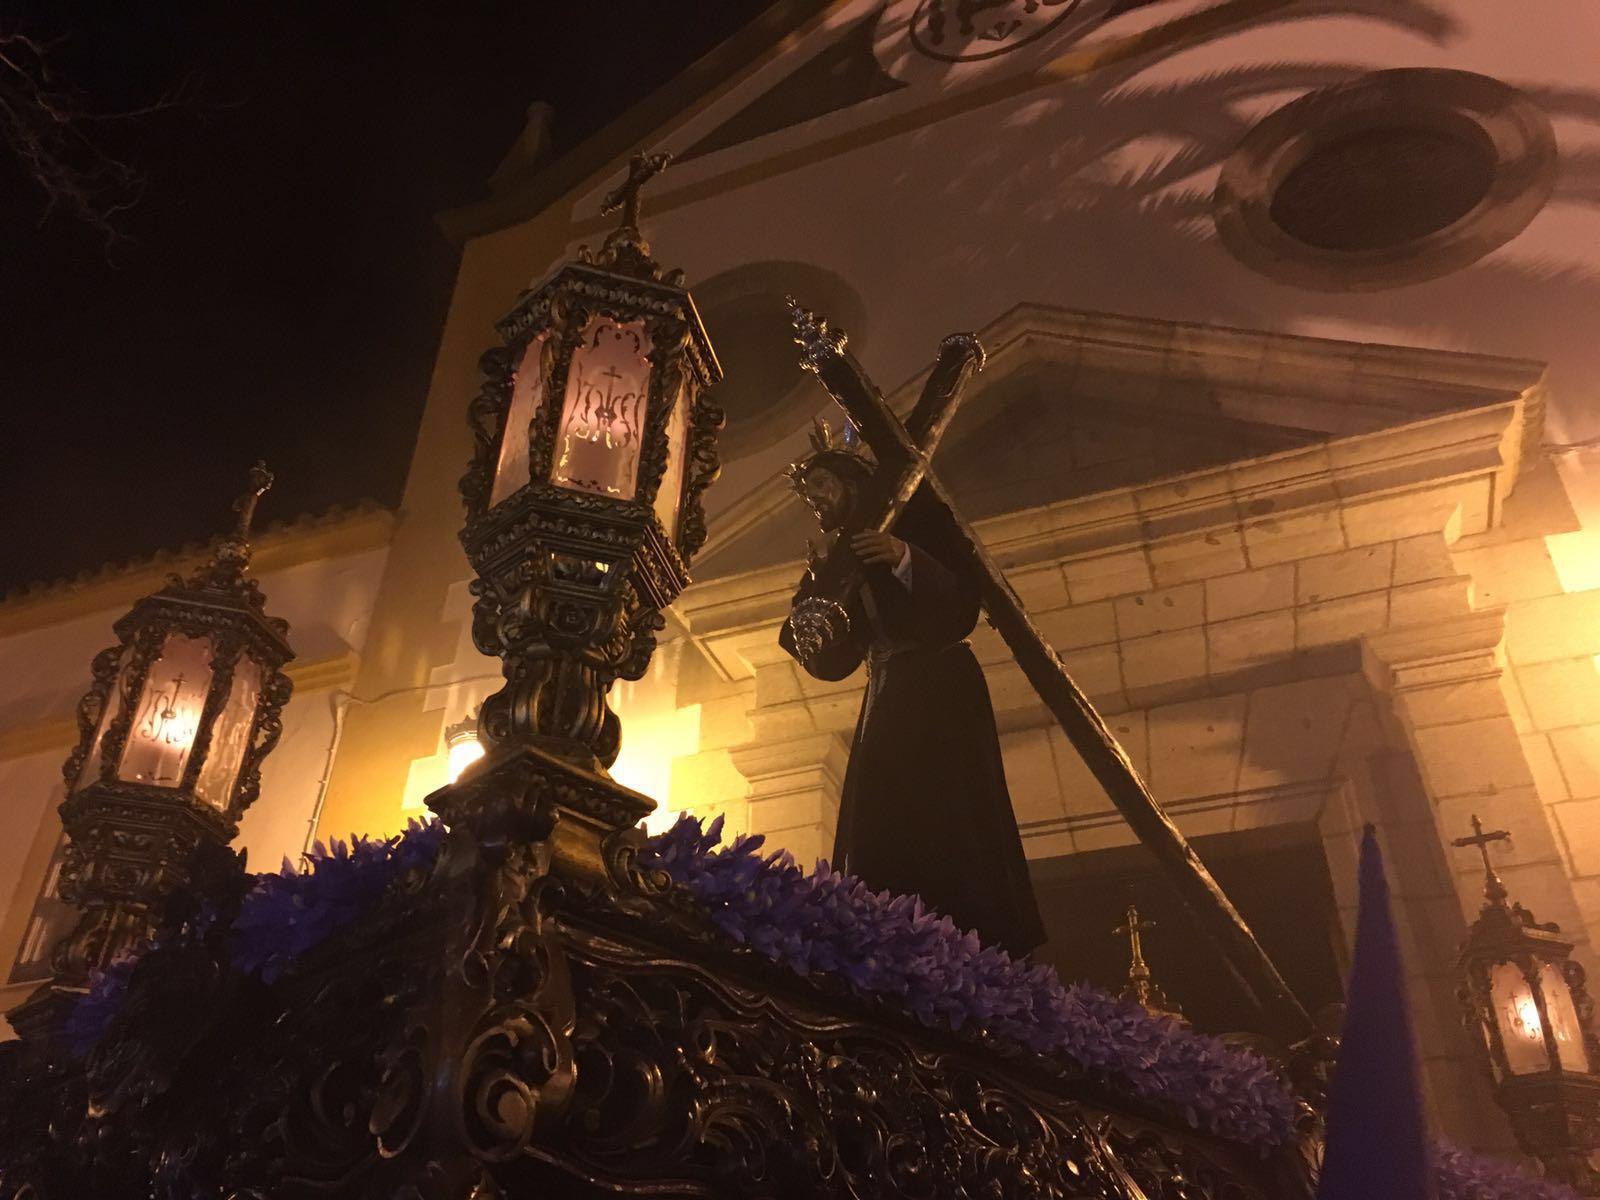 SEMANA SANTA 2017: MARTES SANTO